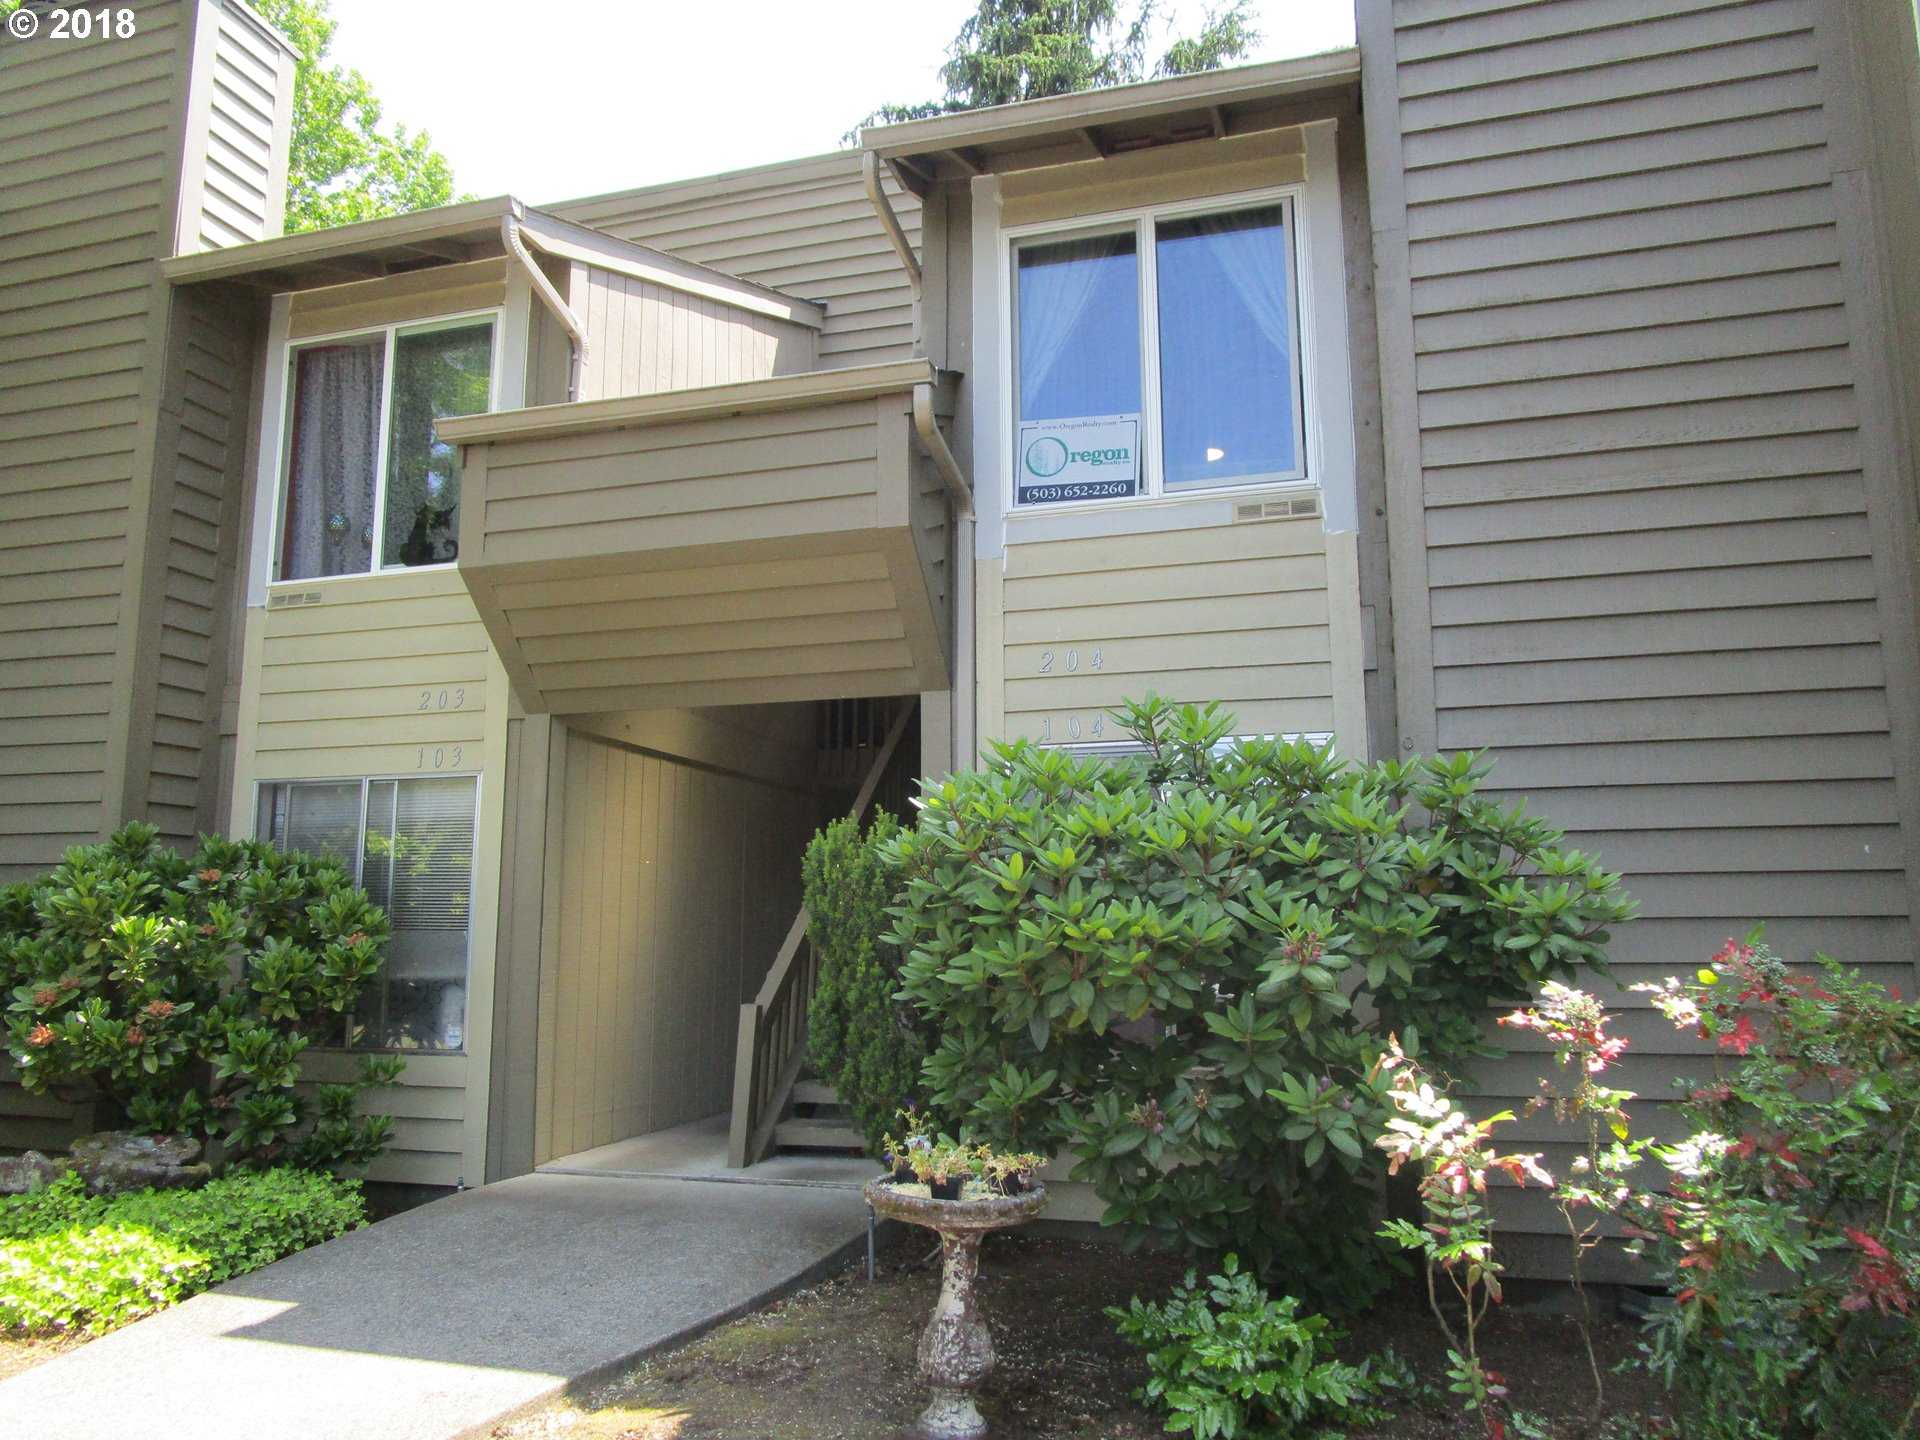 $200,000 - 3Br/2Ba -  for Sale in Beaverton